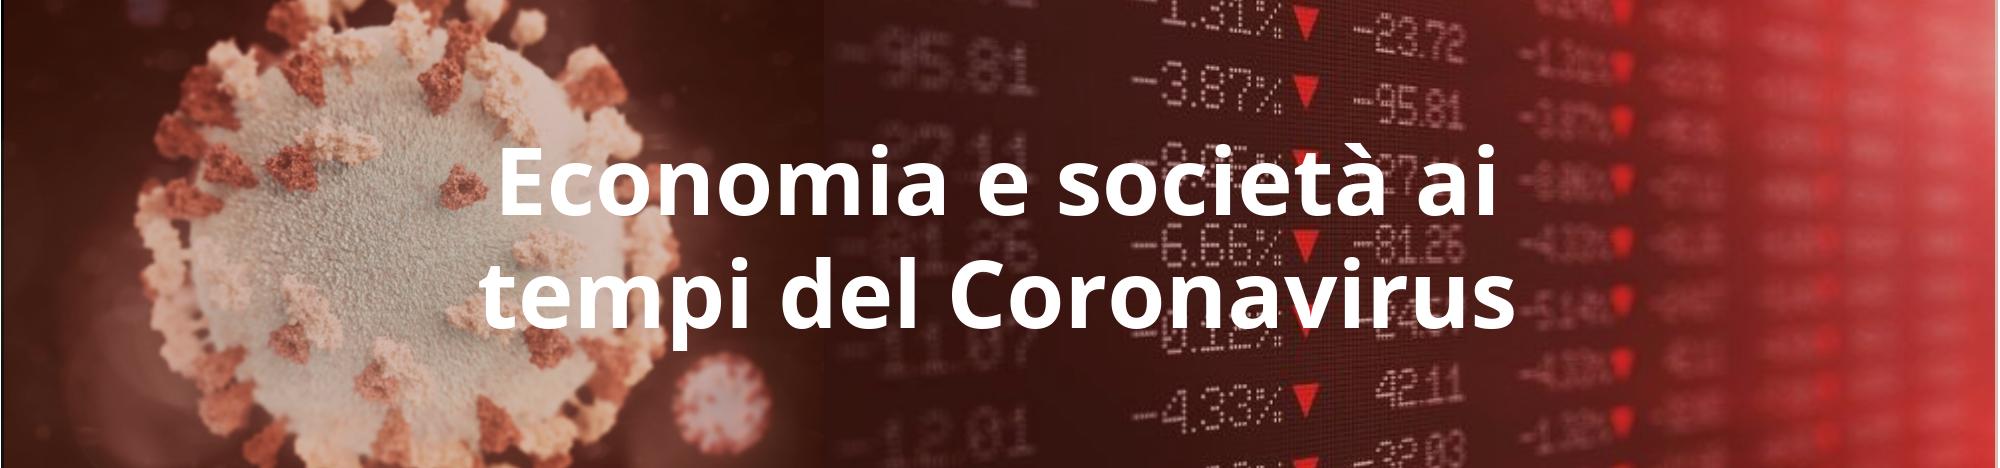 speciale coronavirus Sbilanciamoci